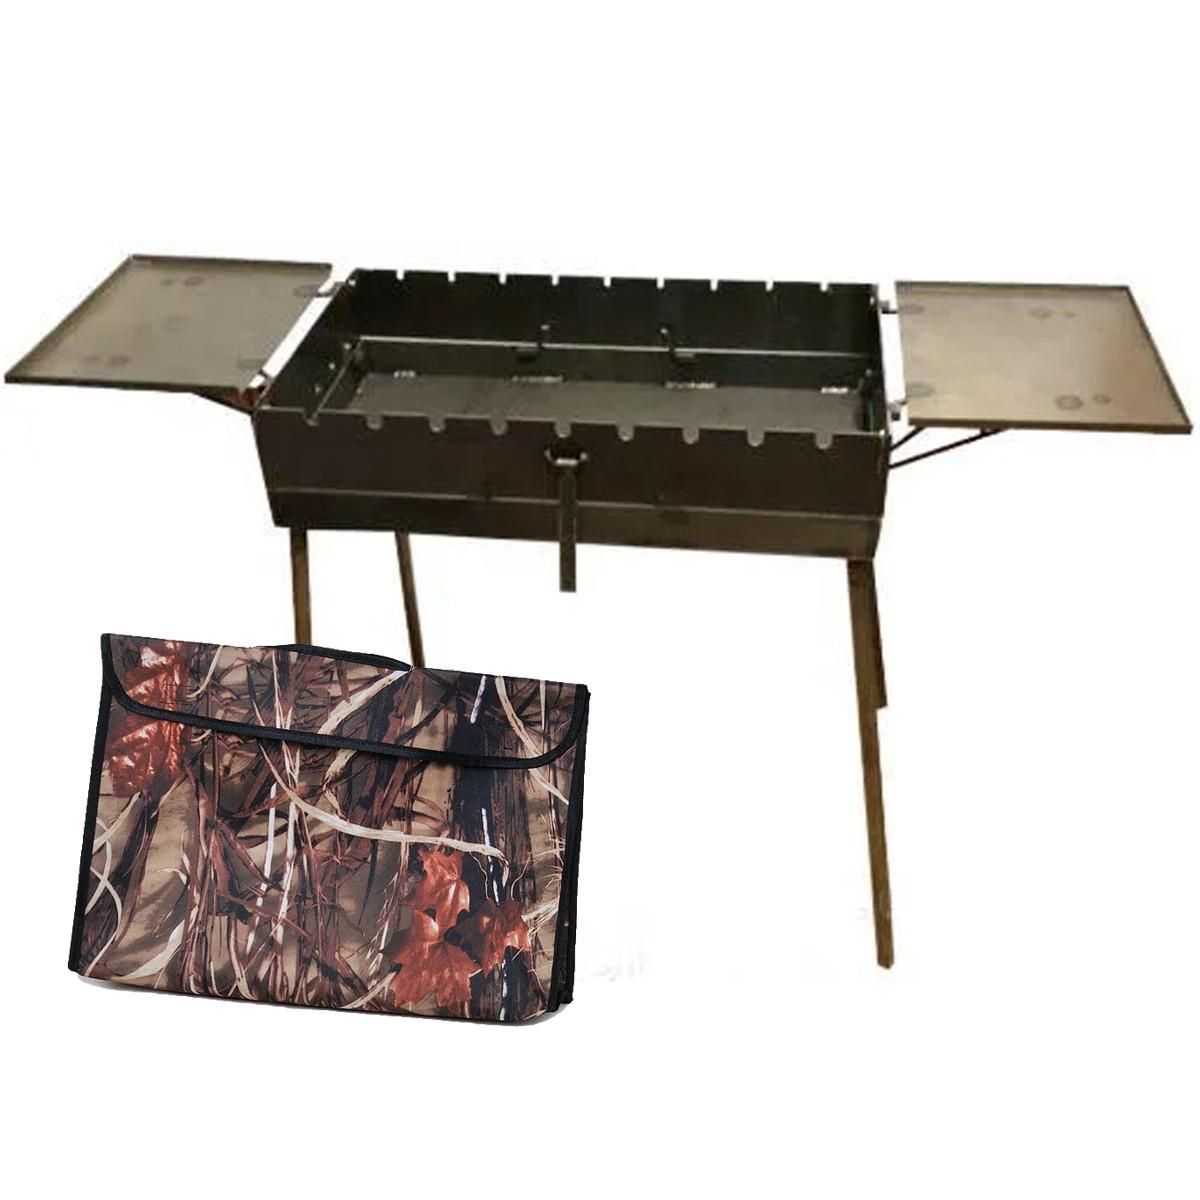 Мангал - чемодан 3 мм на 9 шампуров со столиками 570х300х150мм + Чехол